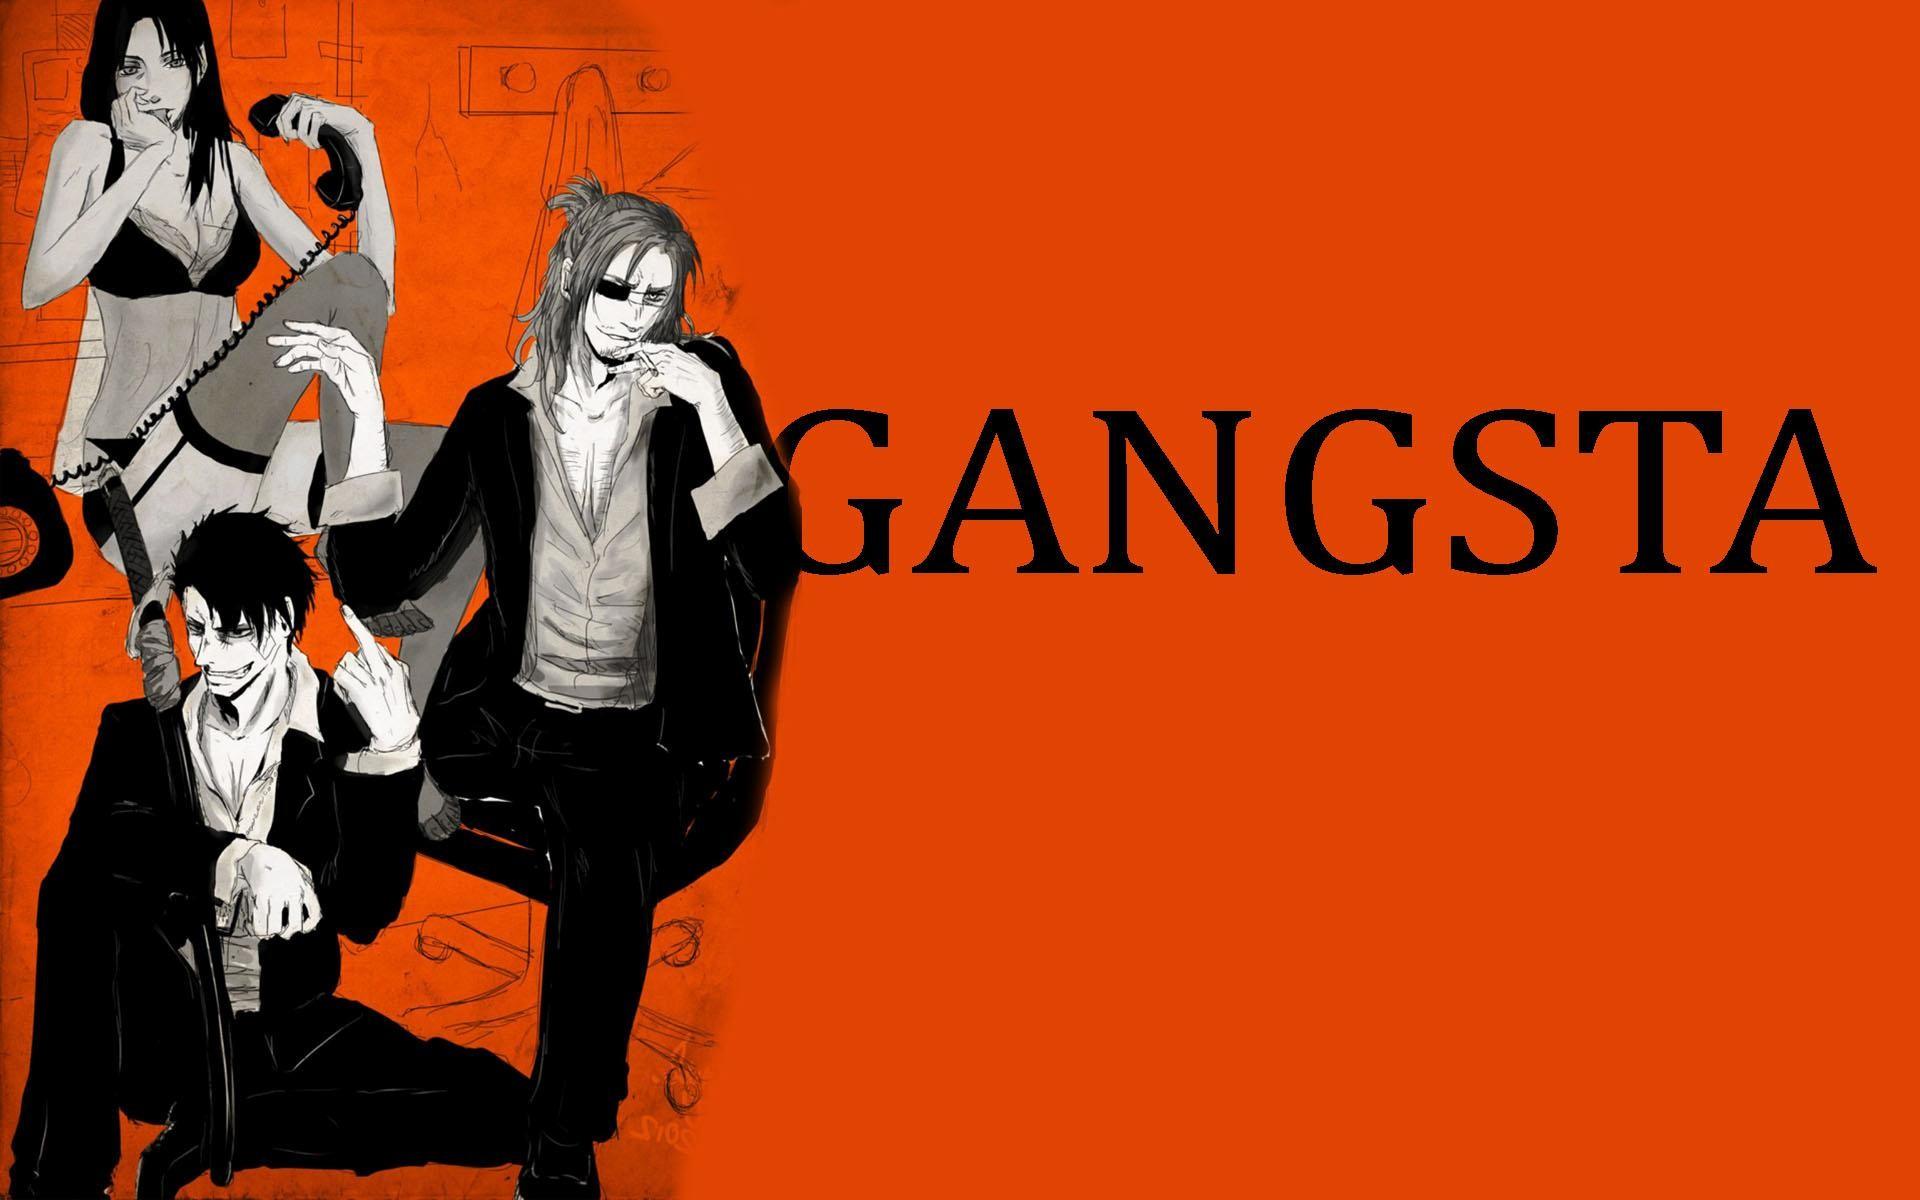 wallpaper.wiki-HD-Gangsta-Pictures-PIC-WPD004433